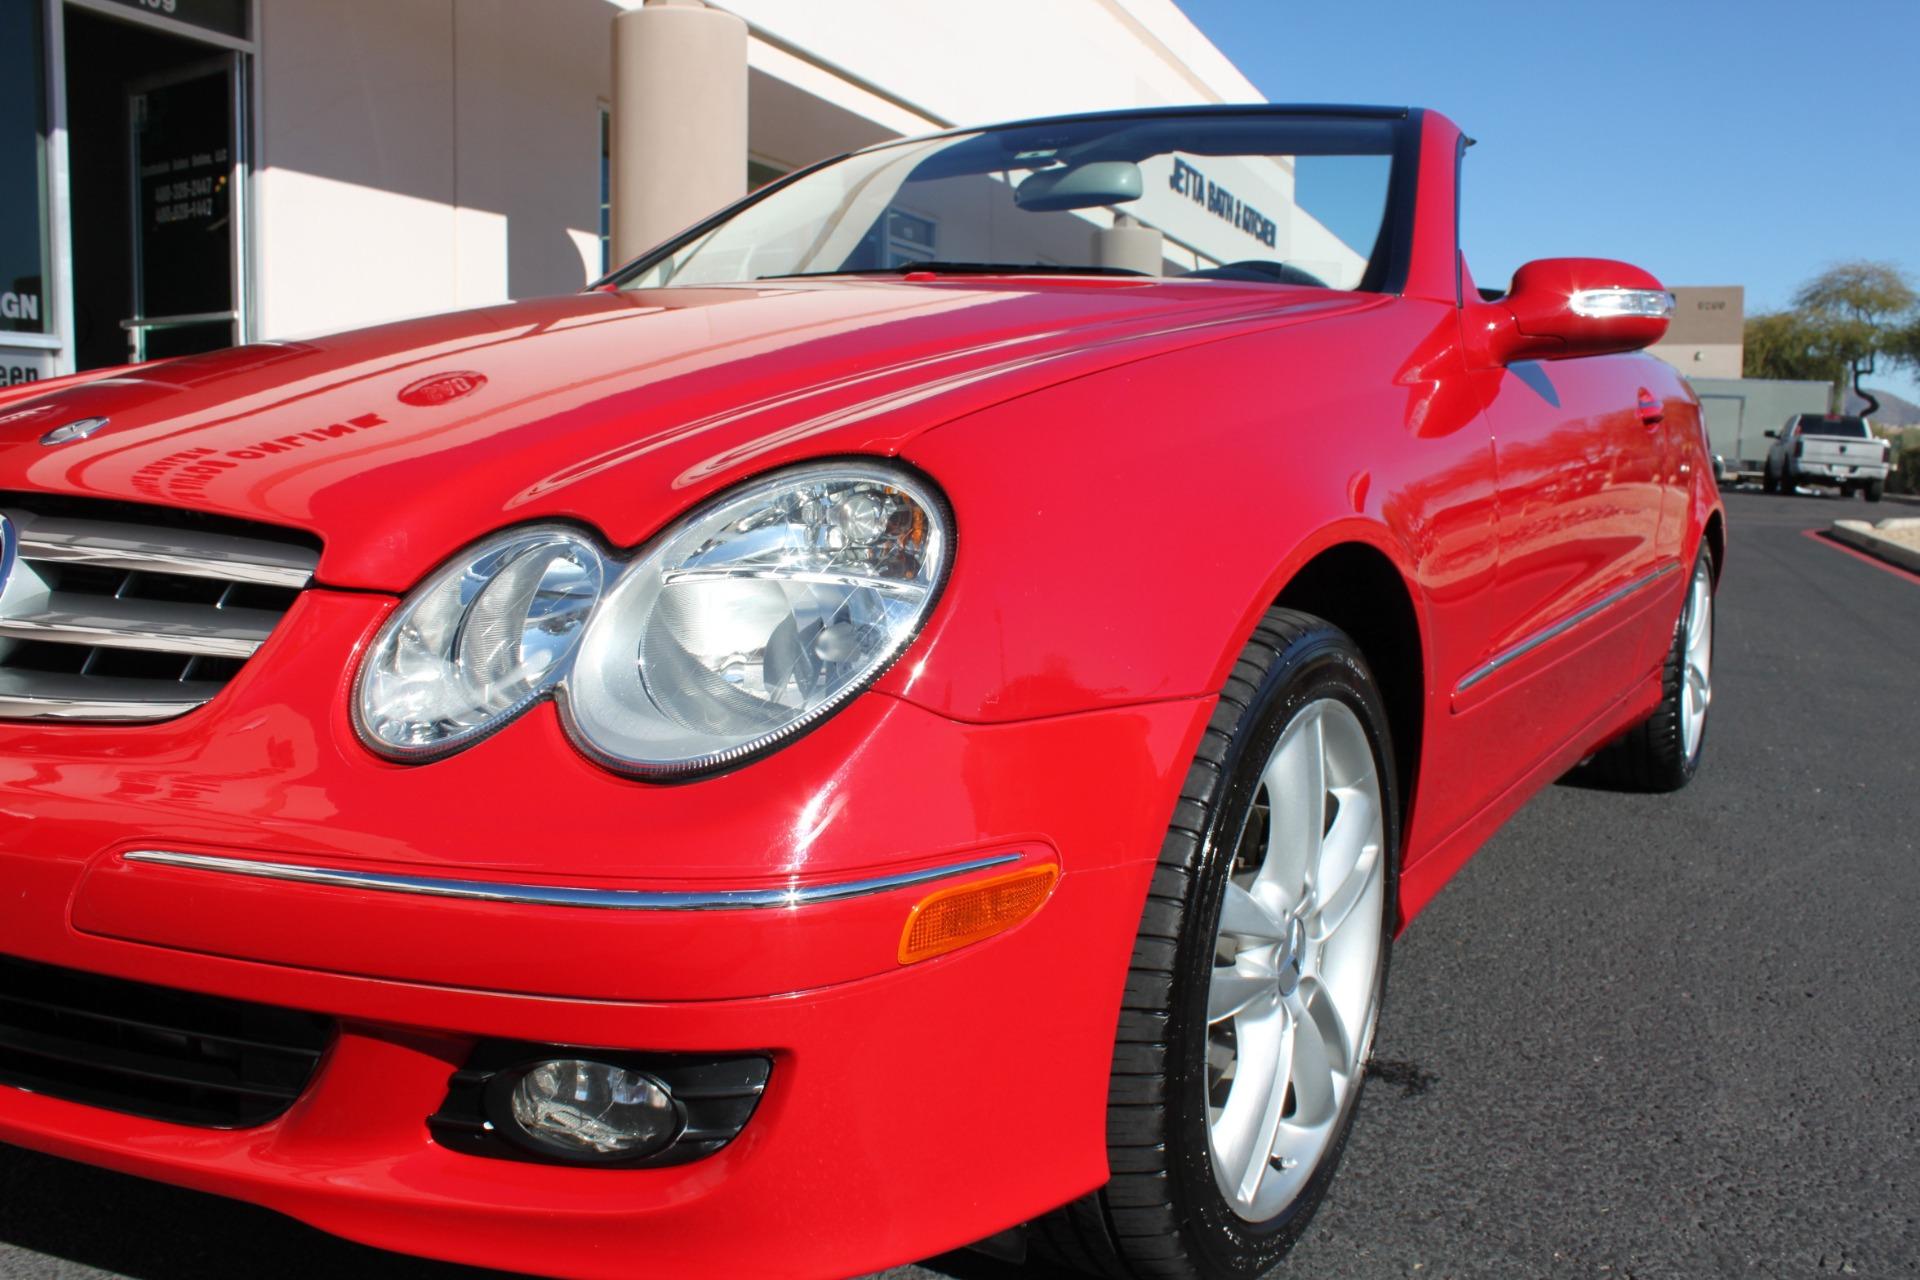 Used-2006-Mercedes-Benz-CLK-Class-CLK350-Cabriolet-35L-Lexus